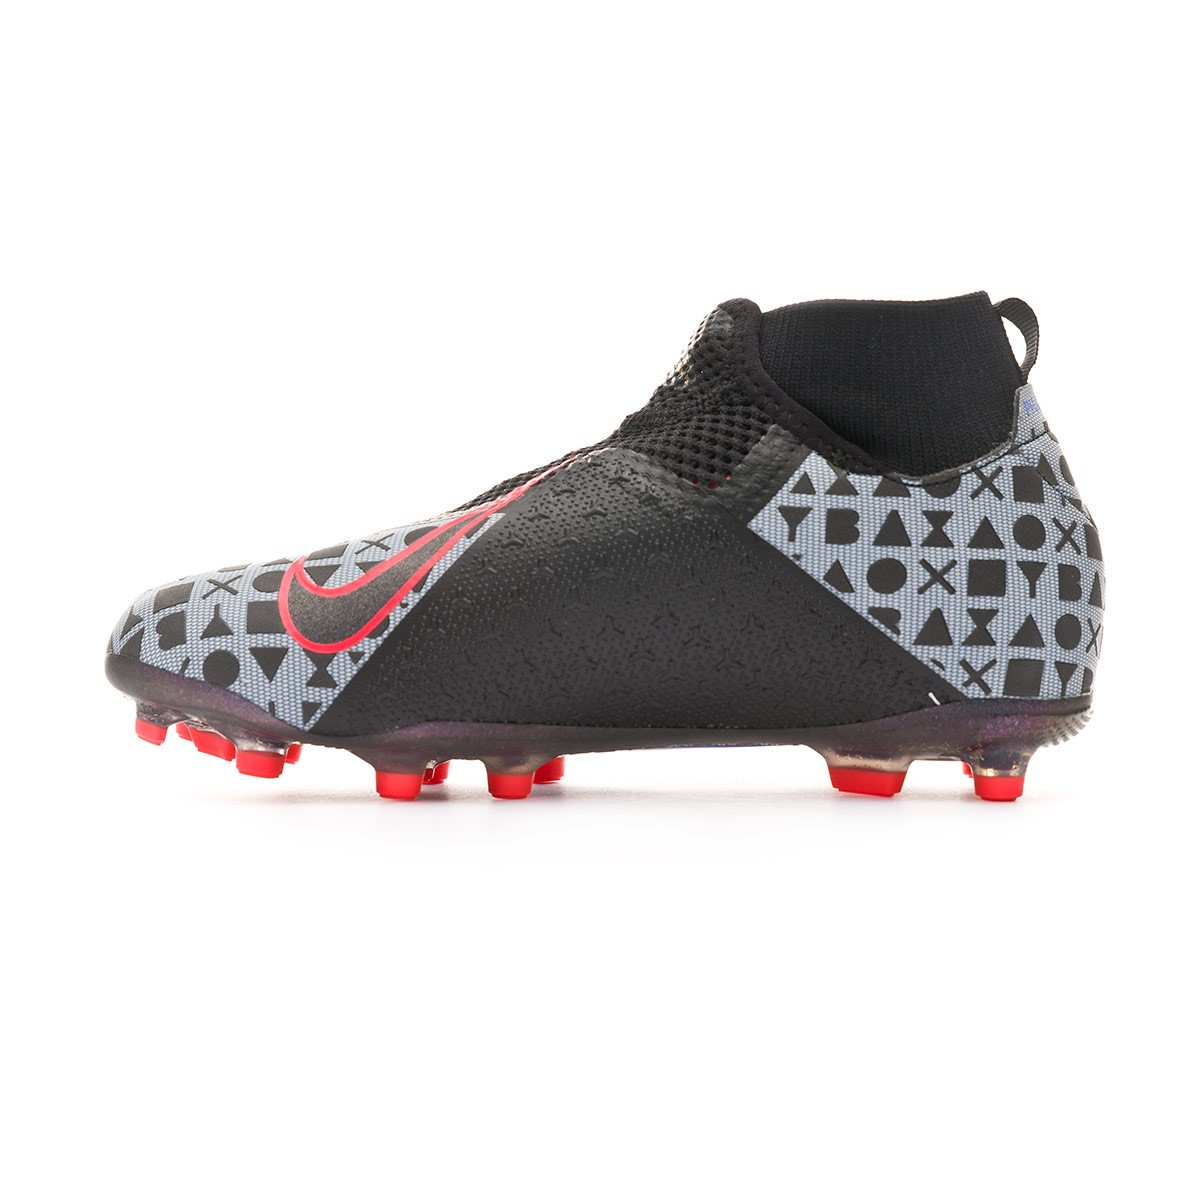 1365f59ba04c3 Football Boots Nike Phantom Vision Academy DF MG EA Sports Niño  White-Black-Bright crimon-Royal pulse - Tienda de fútbol Fútbol Emotion